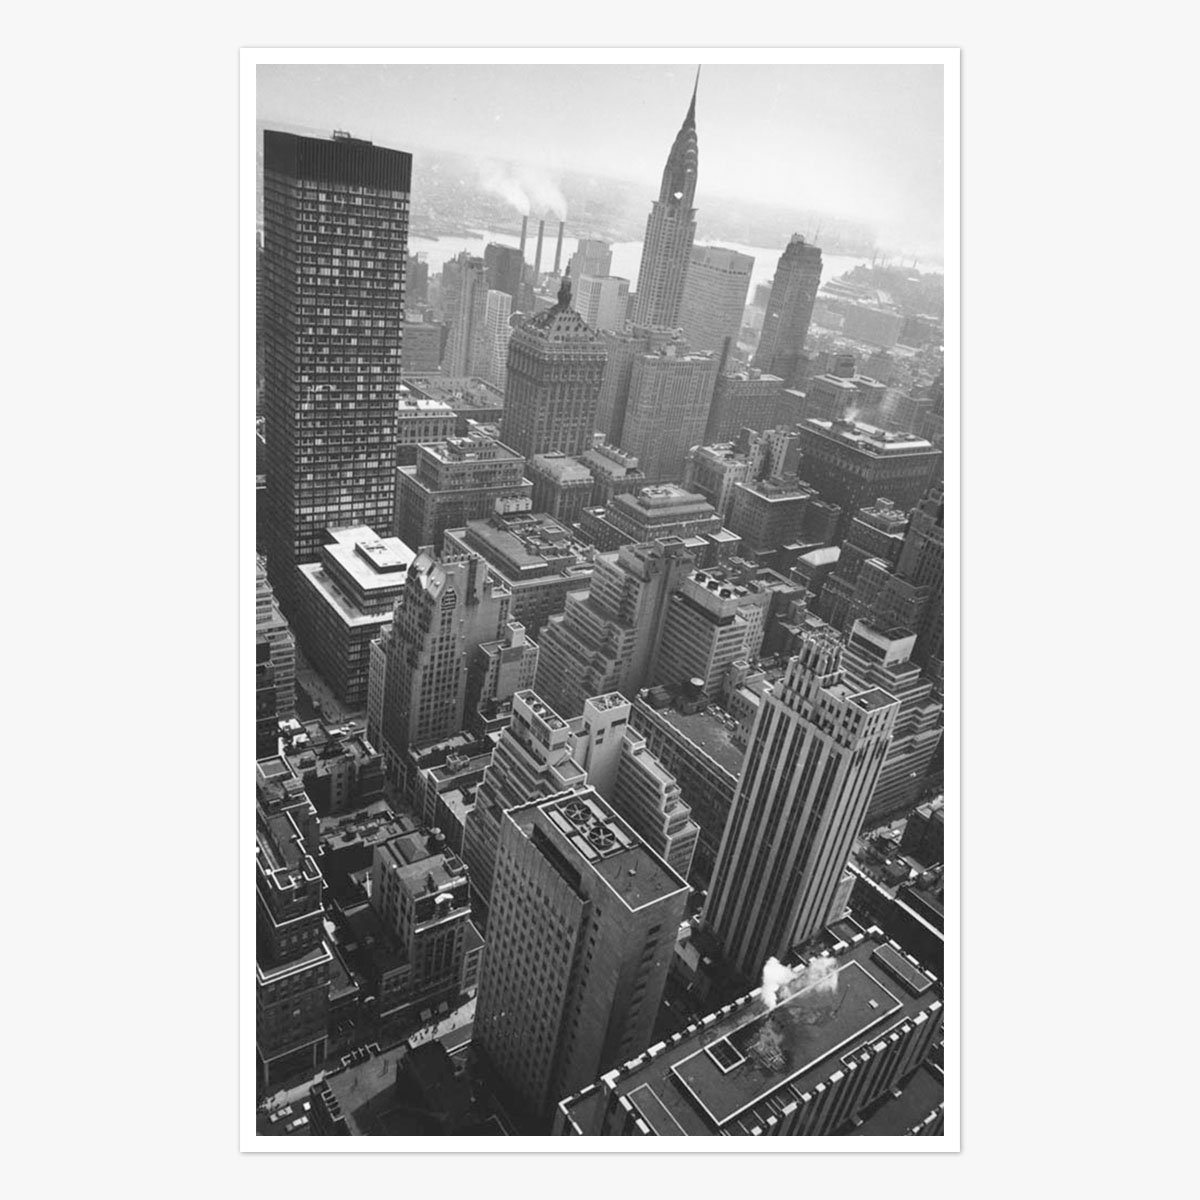 Chrysler Building by Bill Lovelace